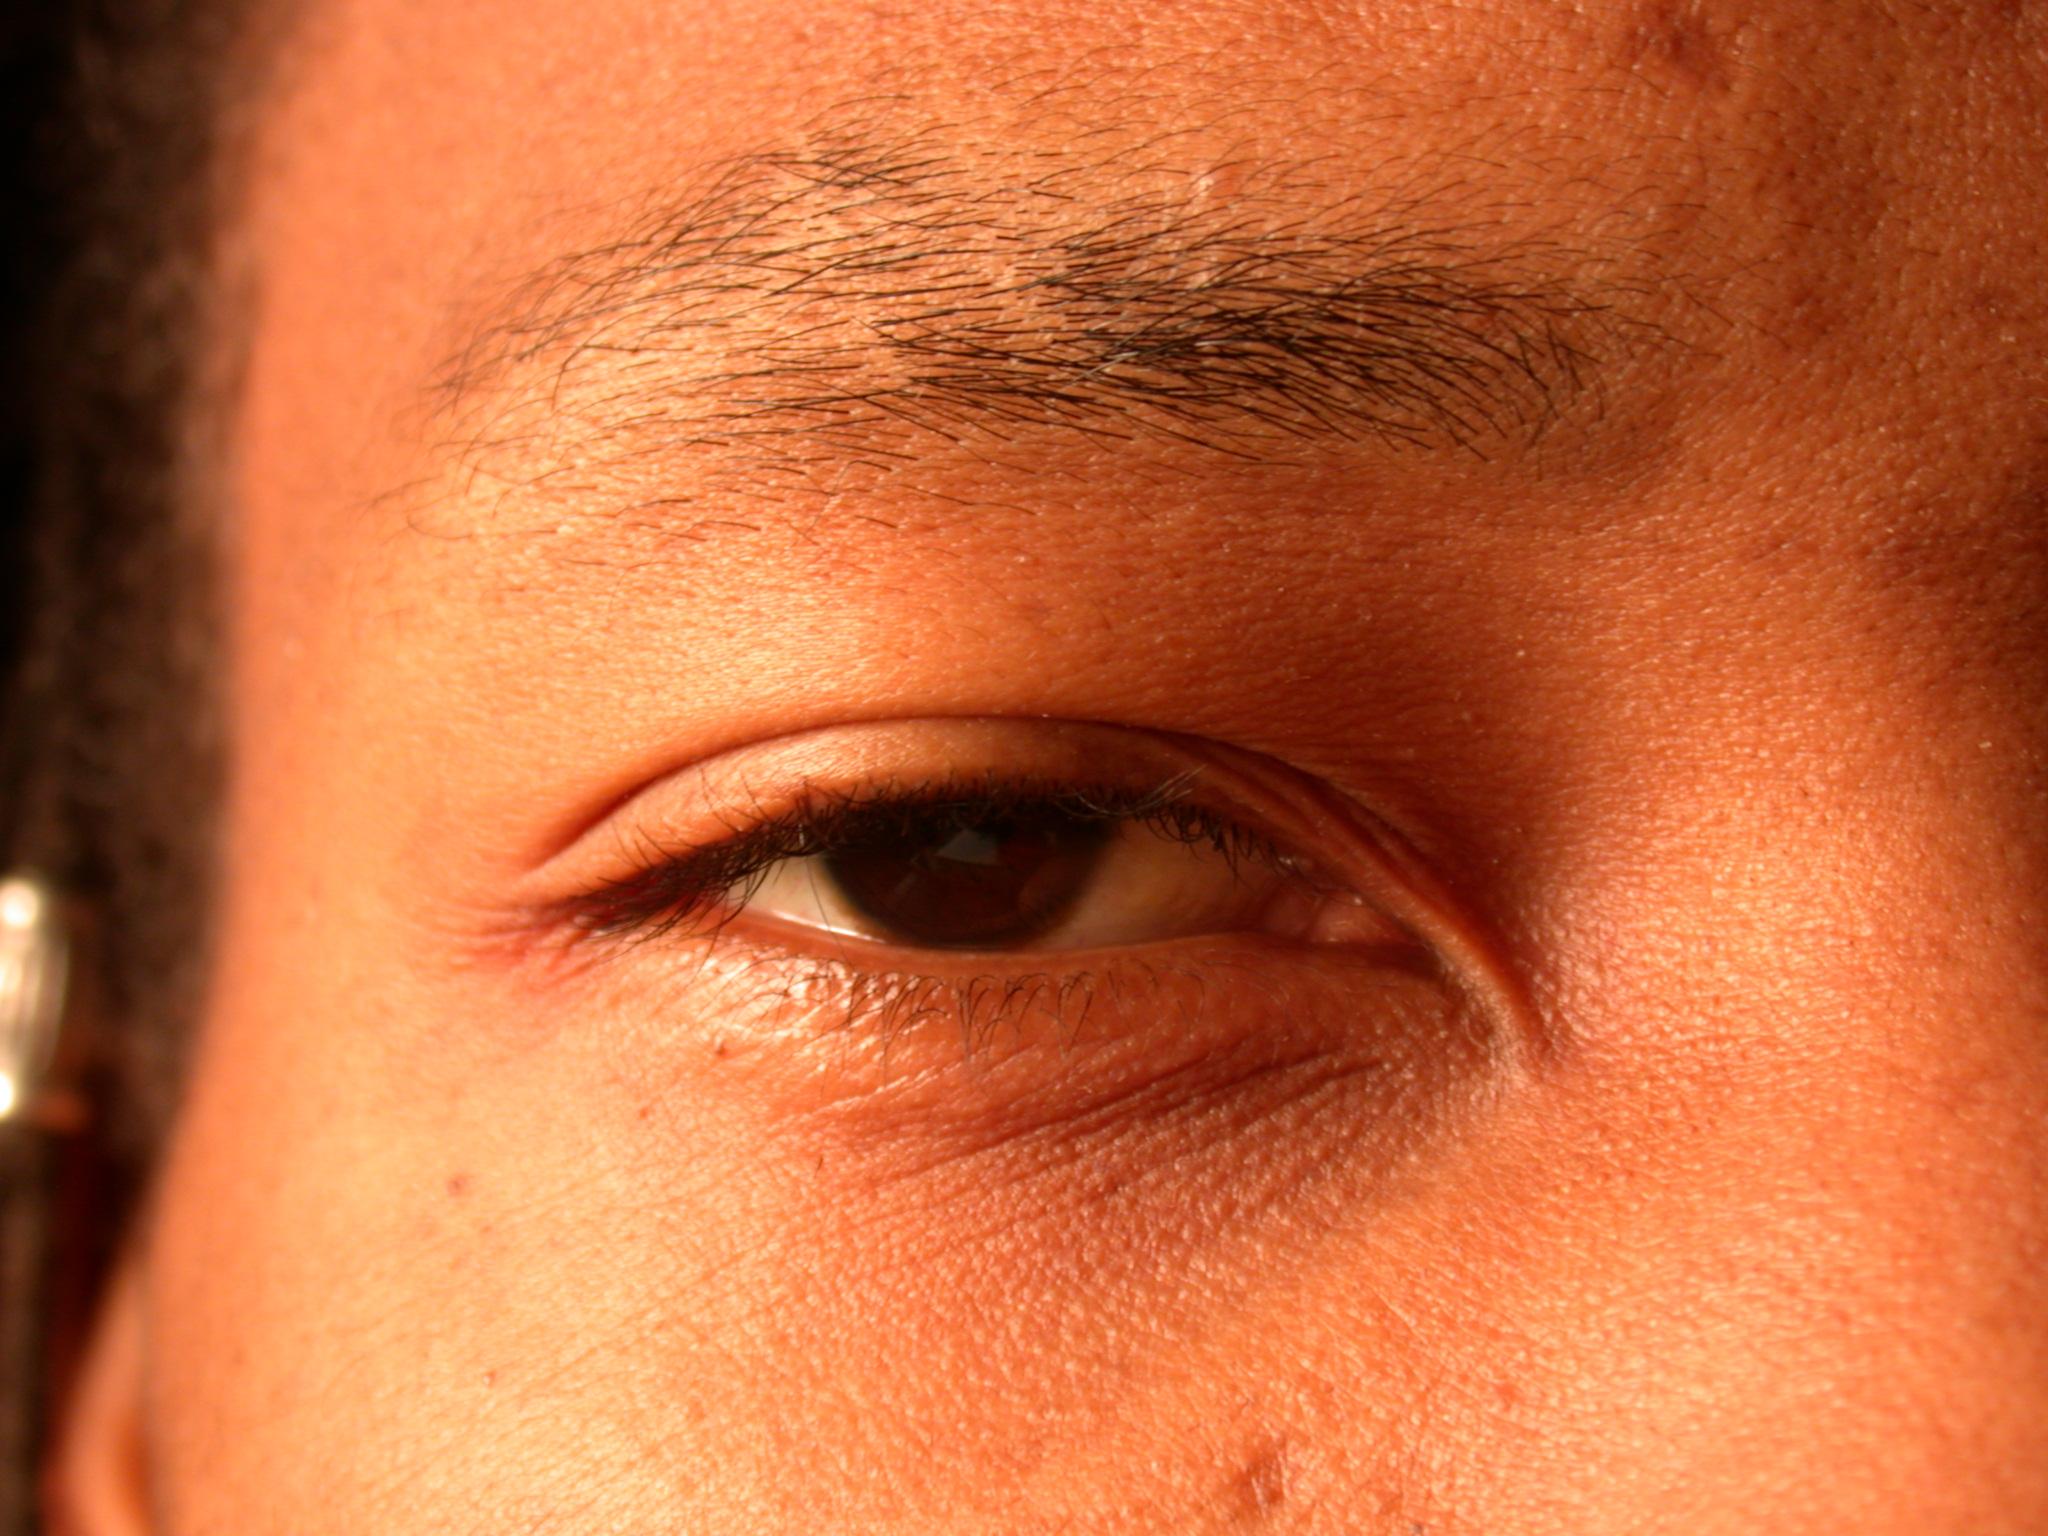 nature characters humanparts eye pupil iris hair eyelash lash brown negro eyebrow brow skin texture